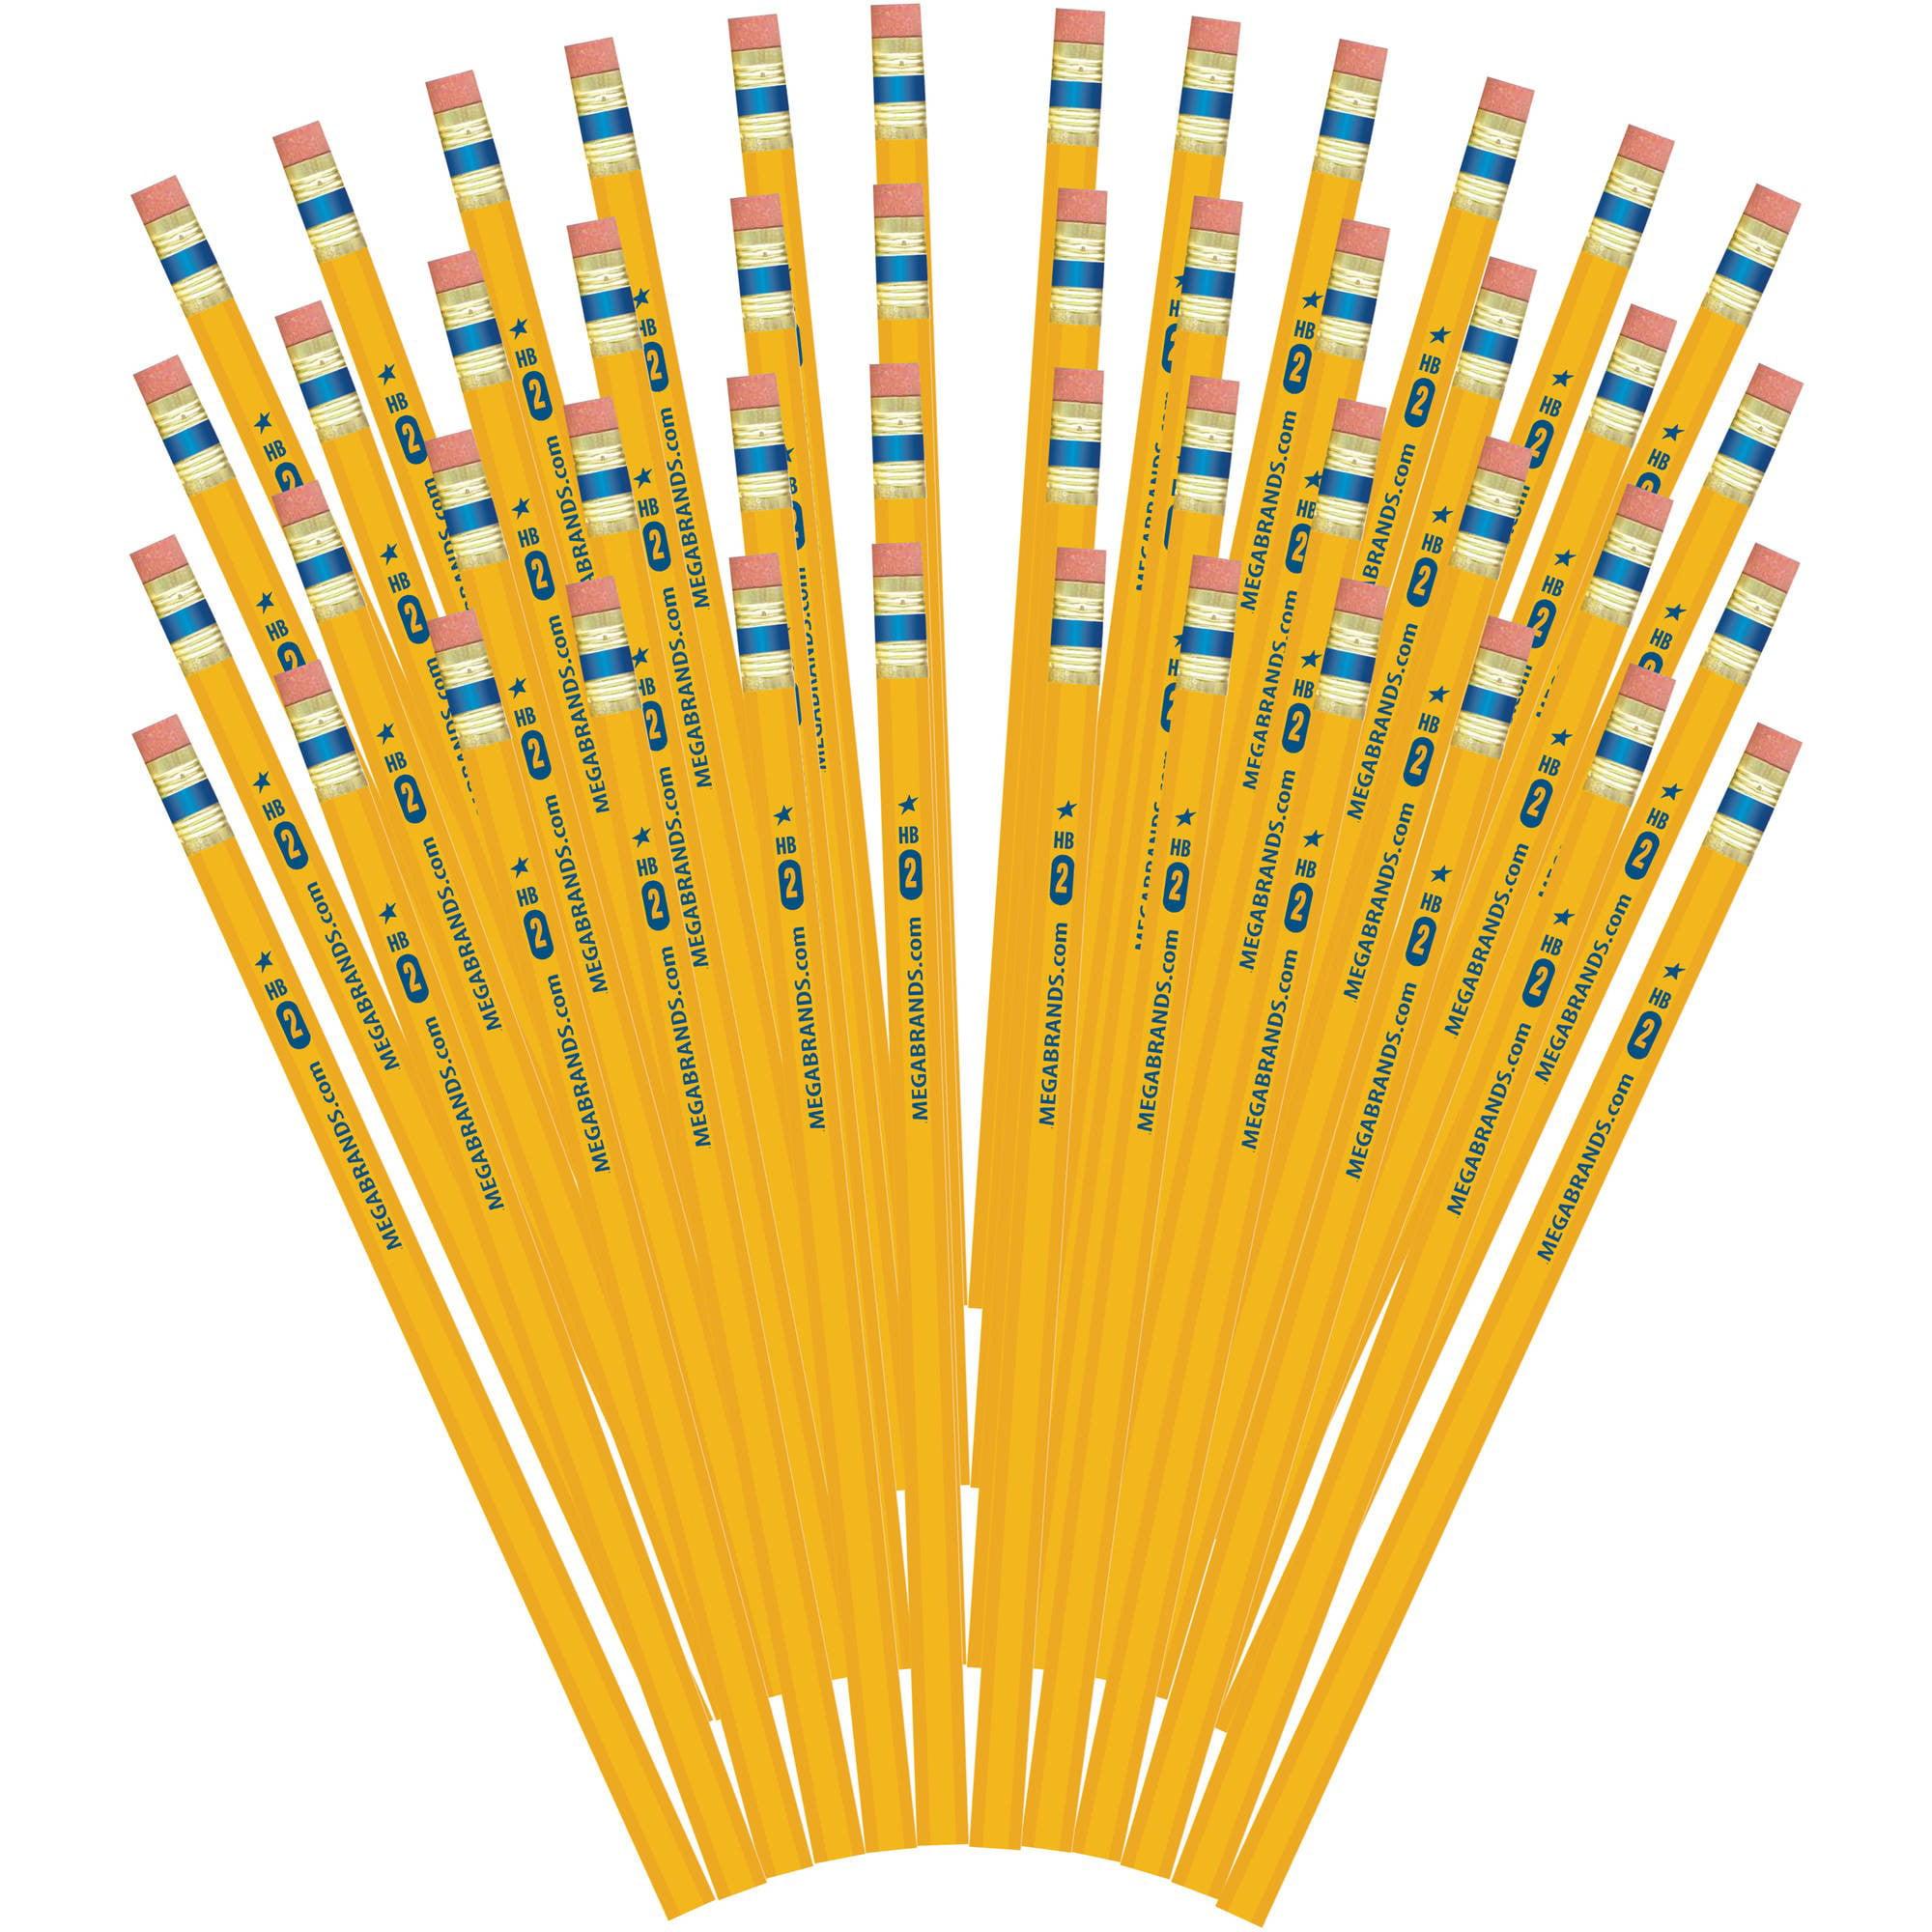 Write Dudes Gold U.S.A. Premium Wood #2 Pencils, 48-Count